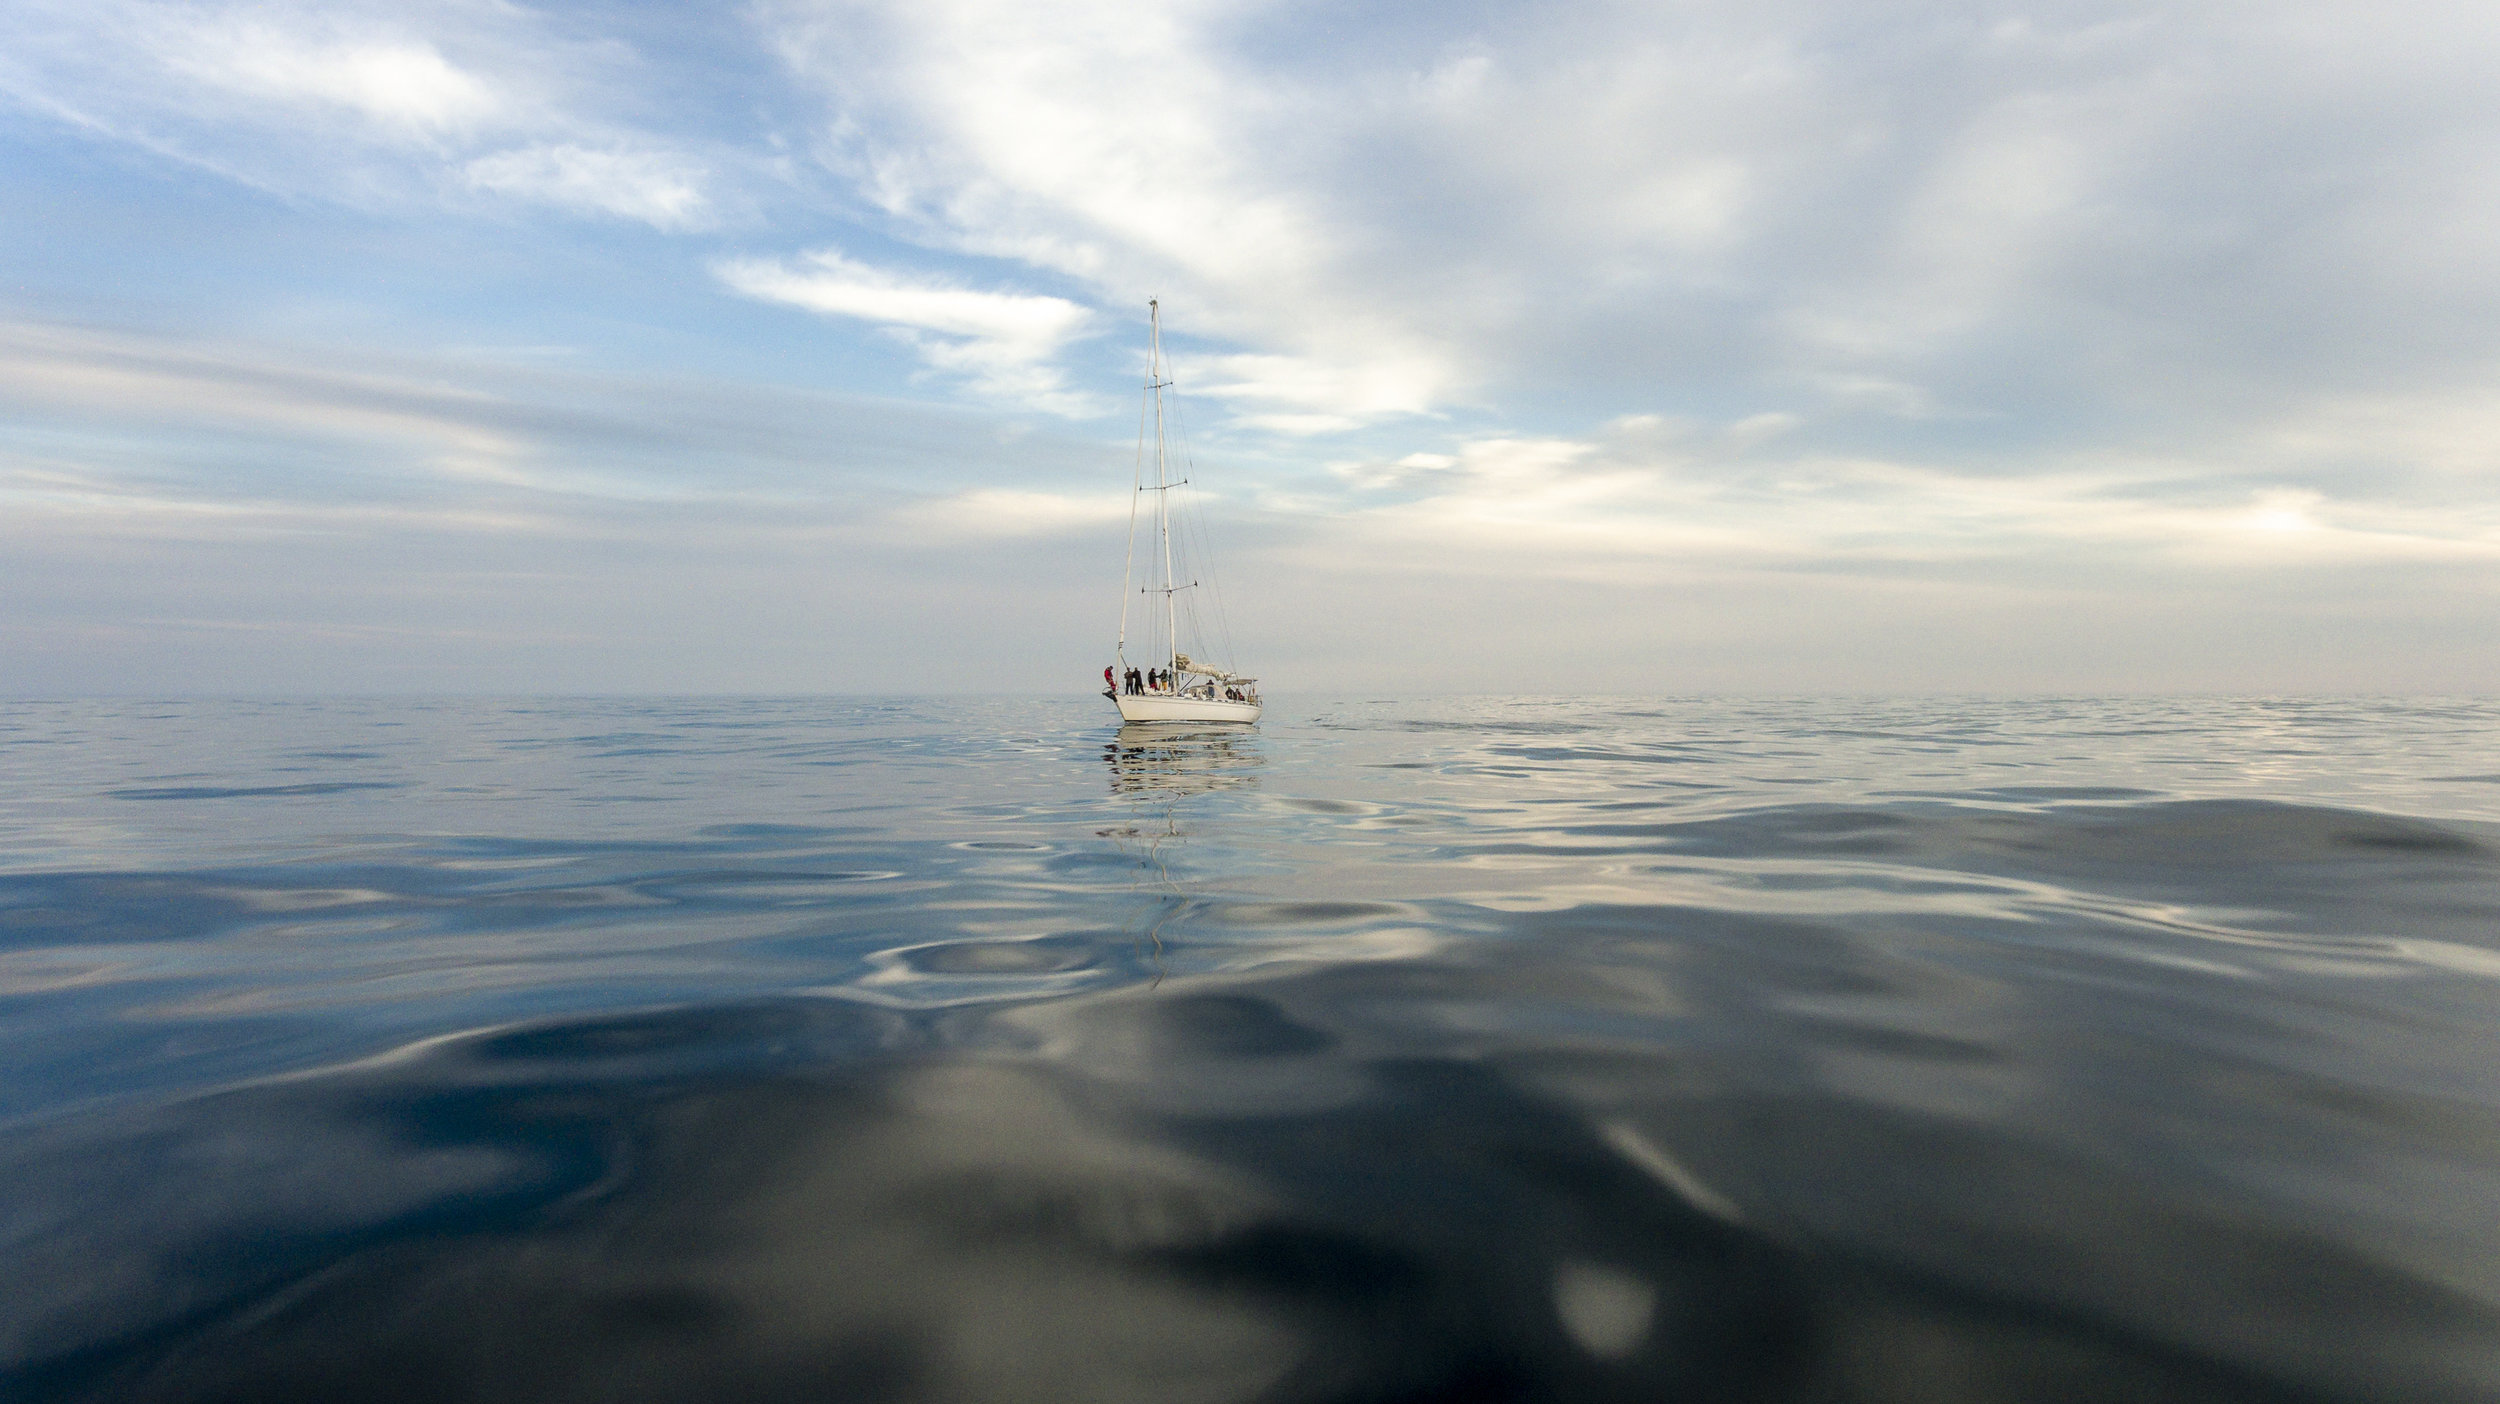 That calm sea! Like mercury, truly unreal.